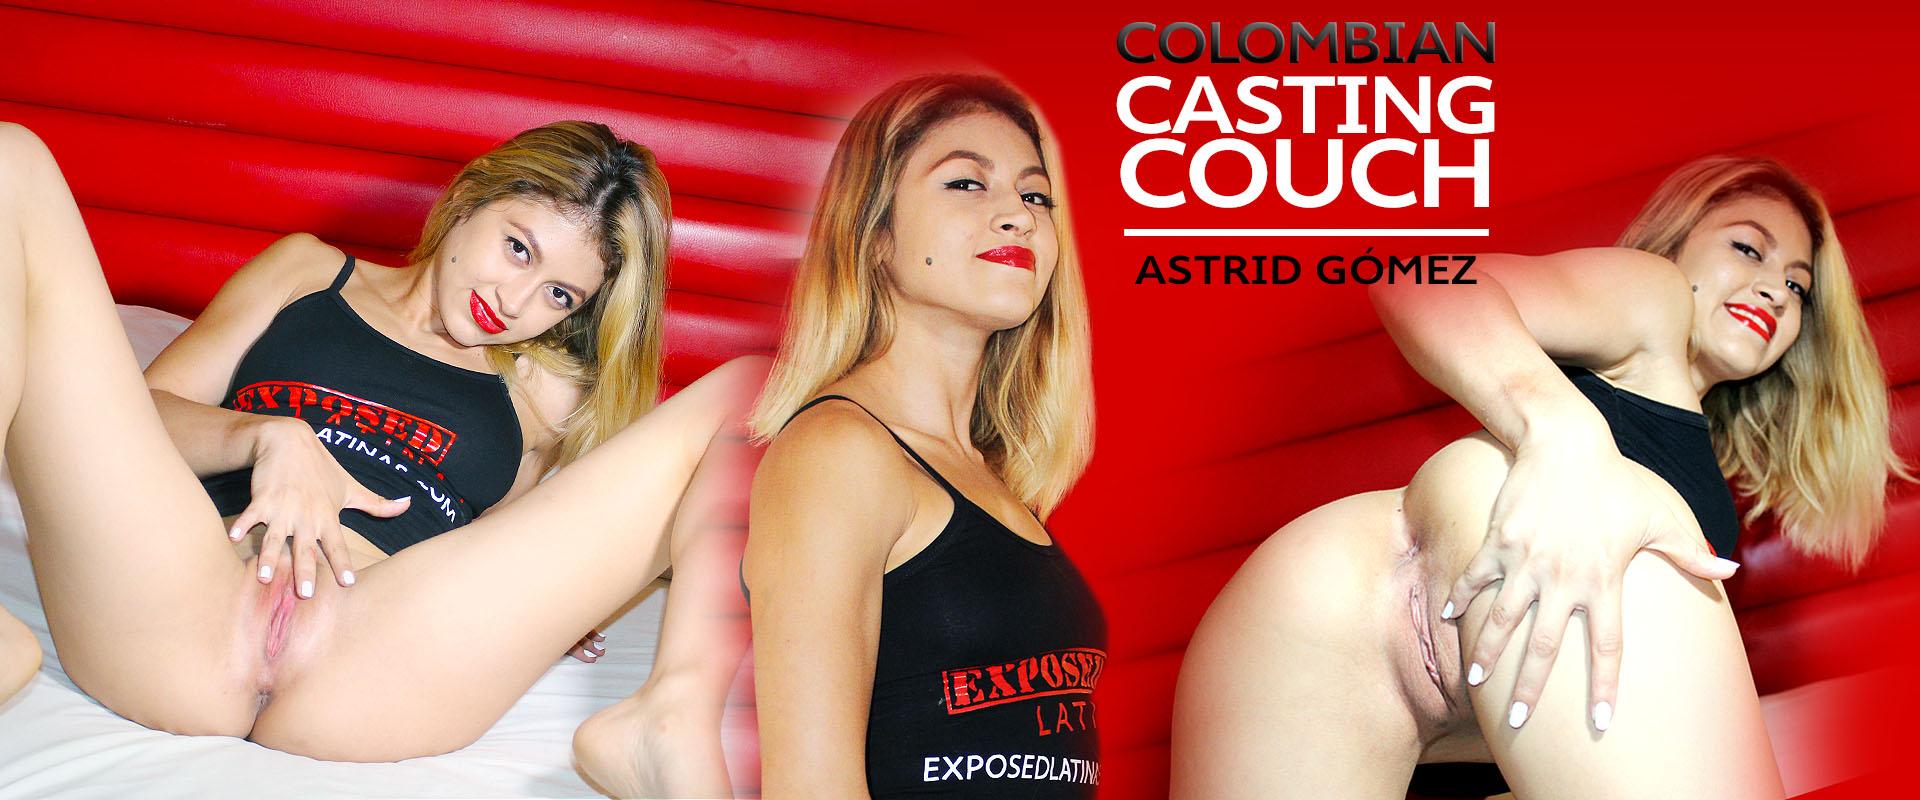 Astrid Gomez